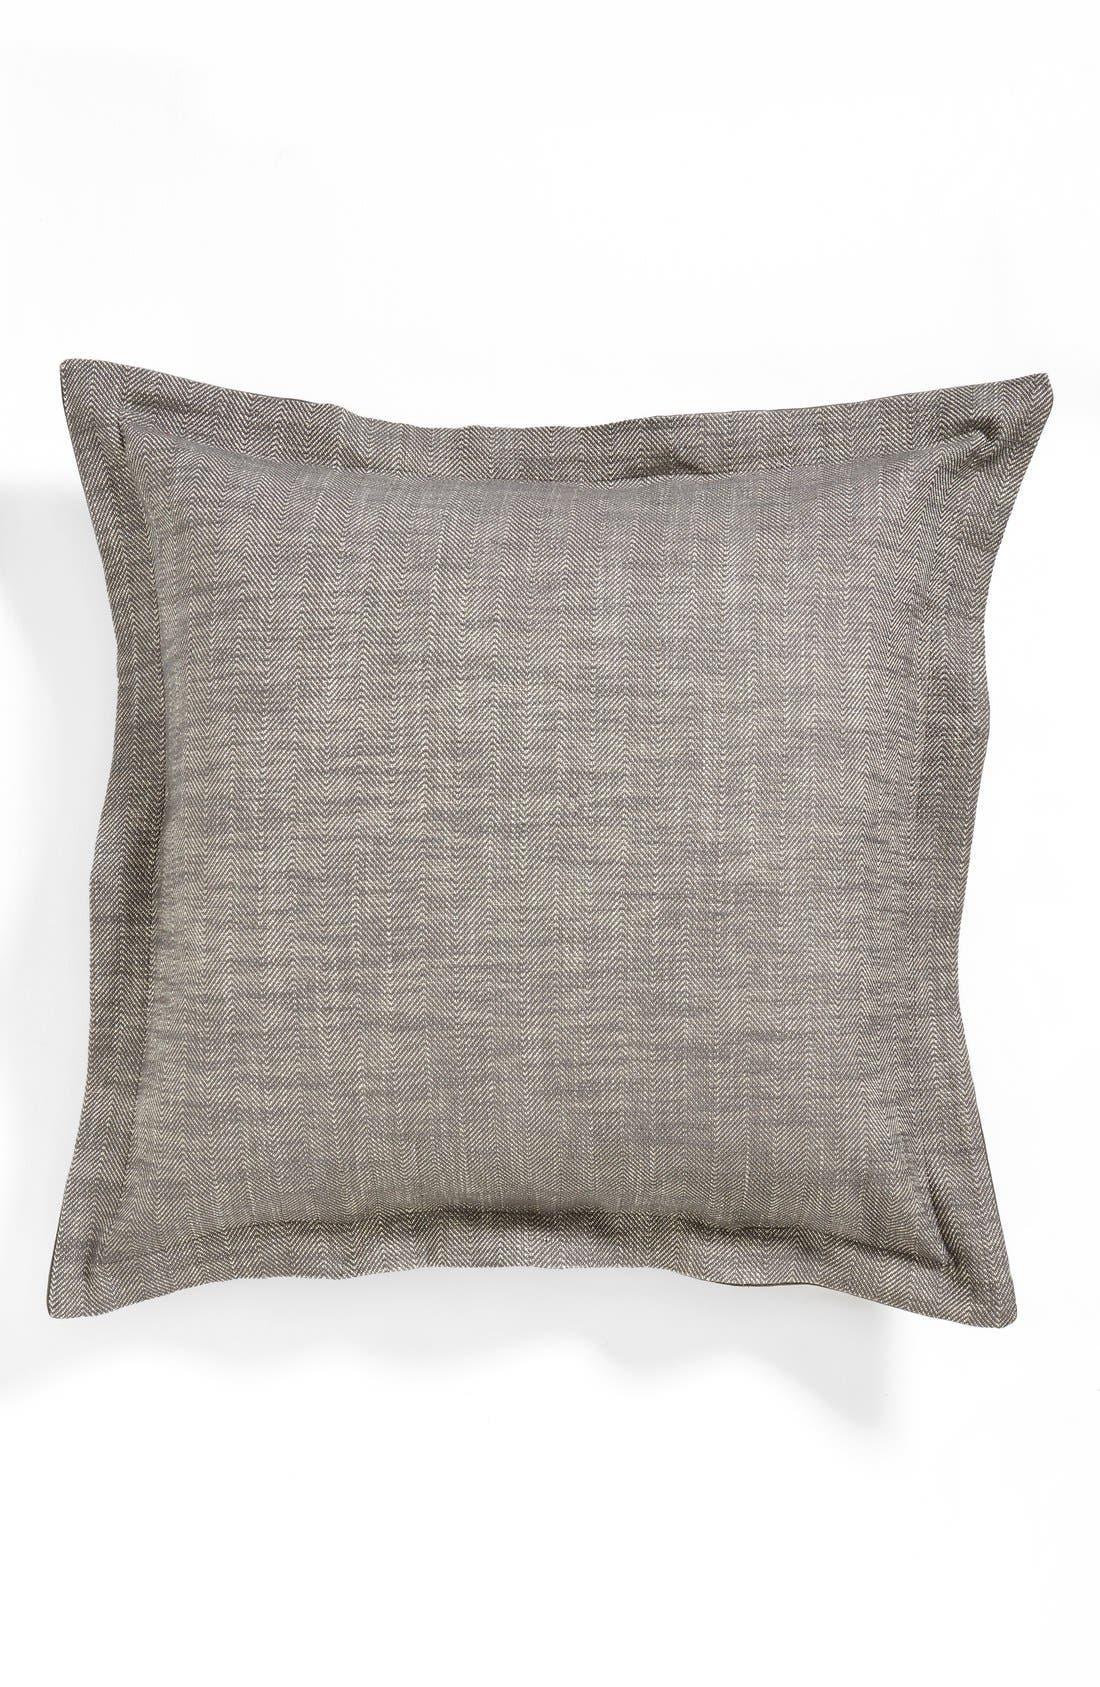 Main Image - Amity Home 'Logan' Euro Pillow Sham